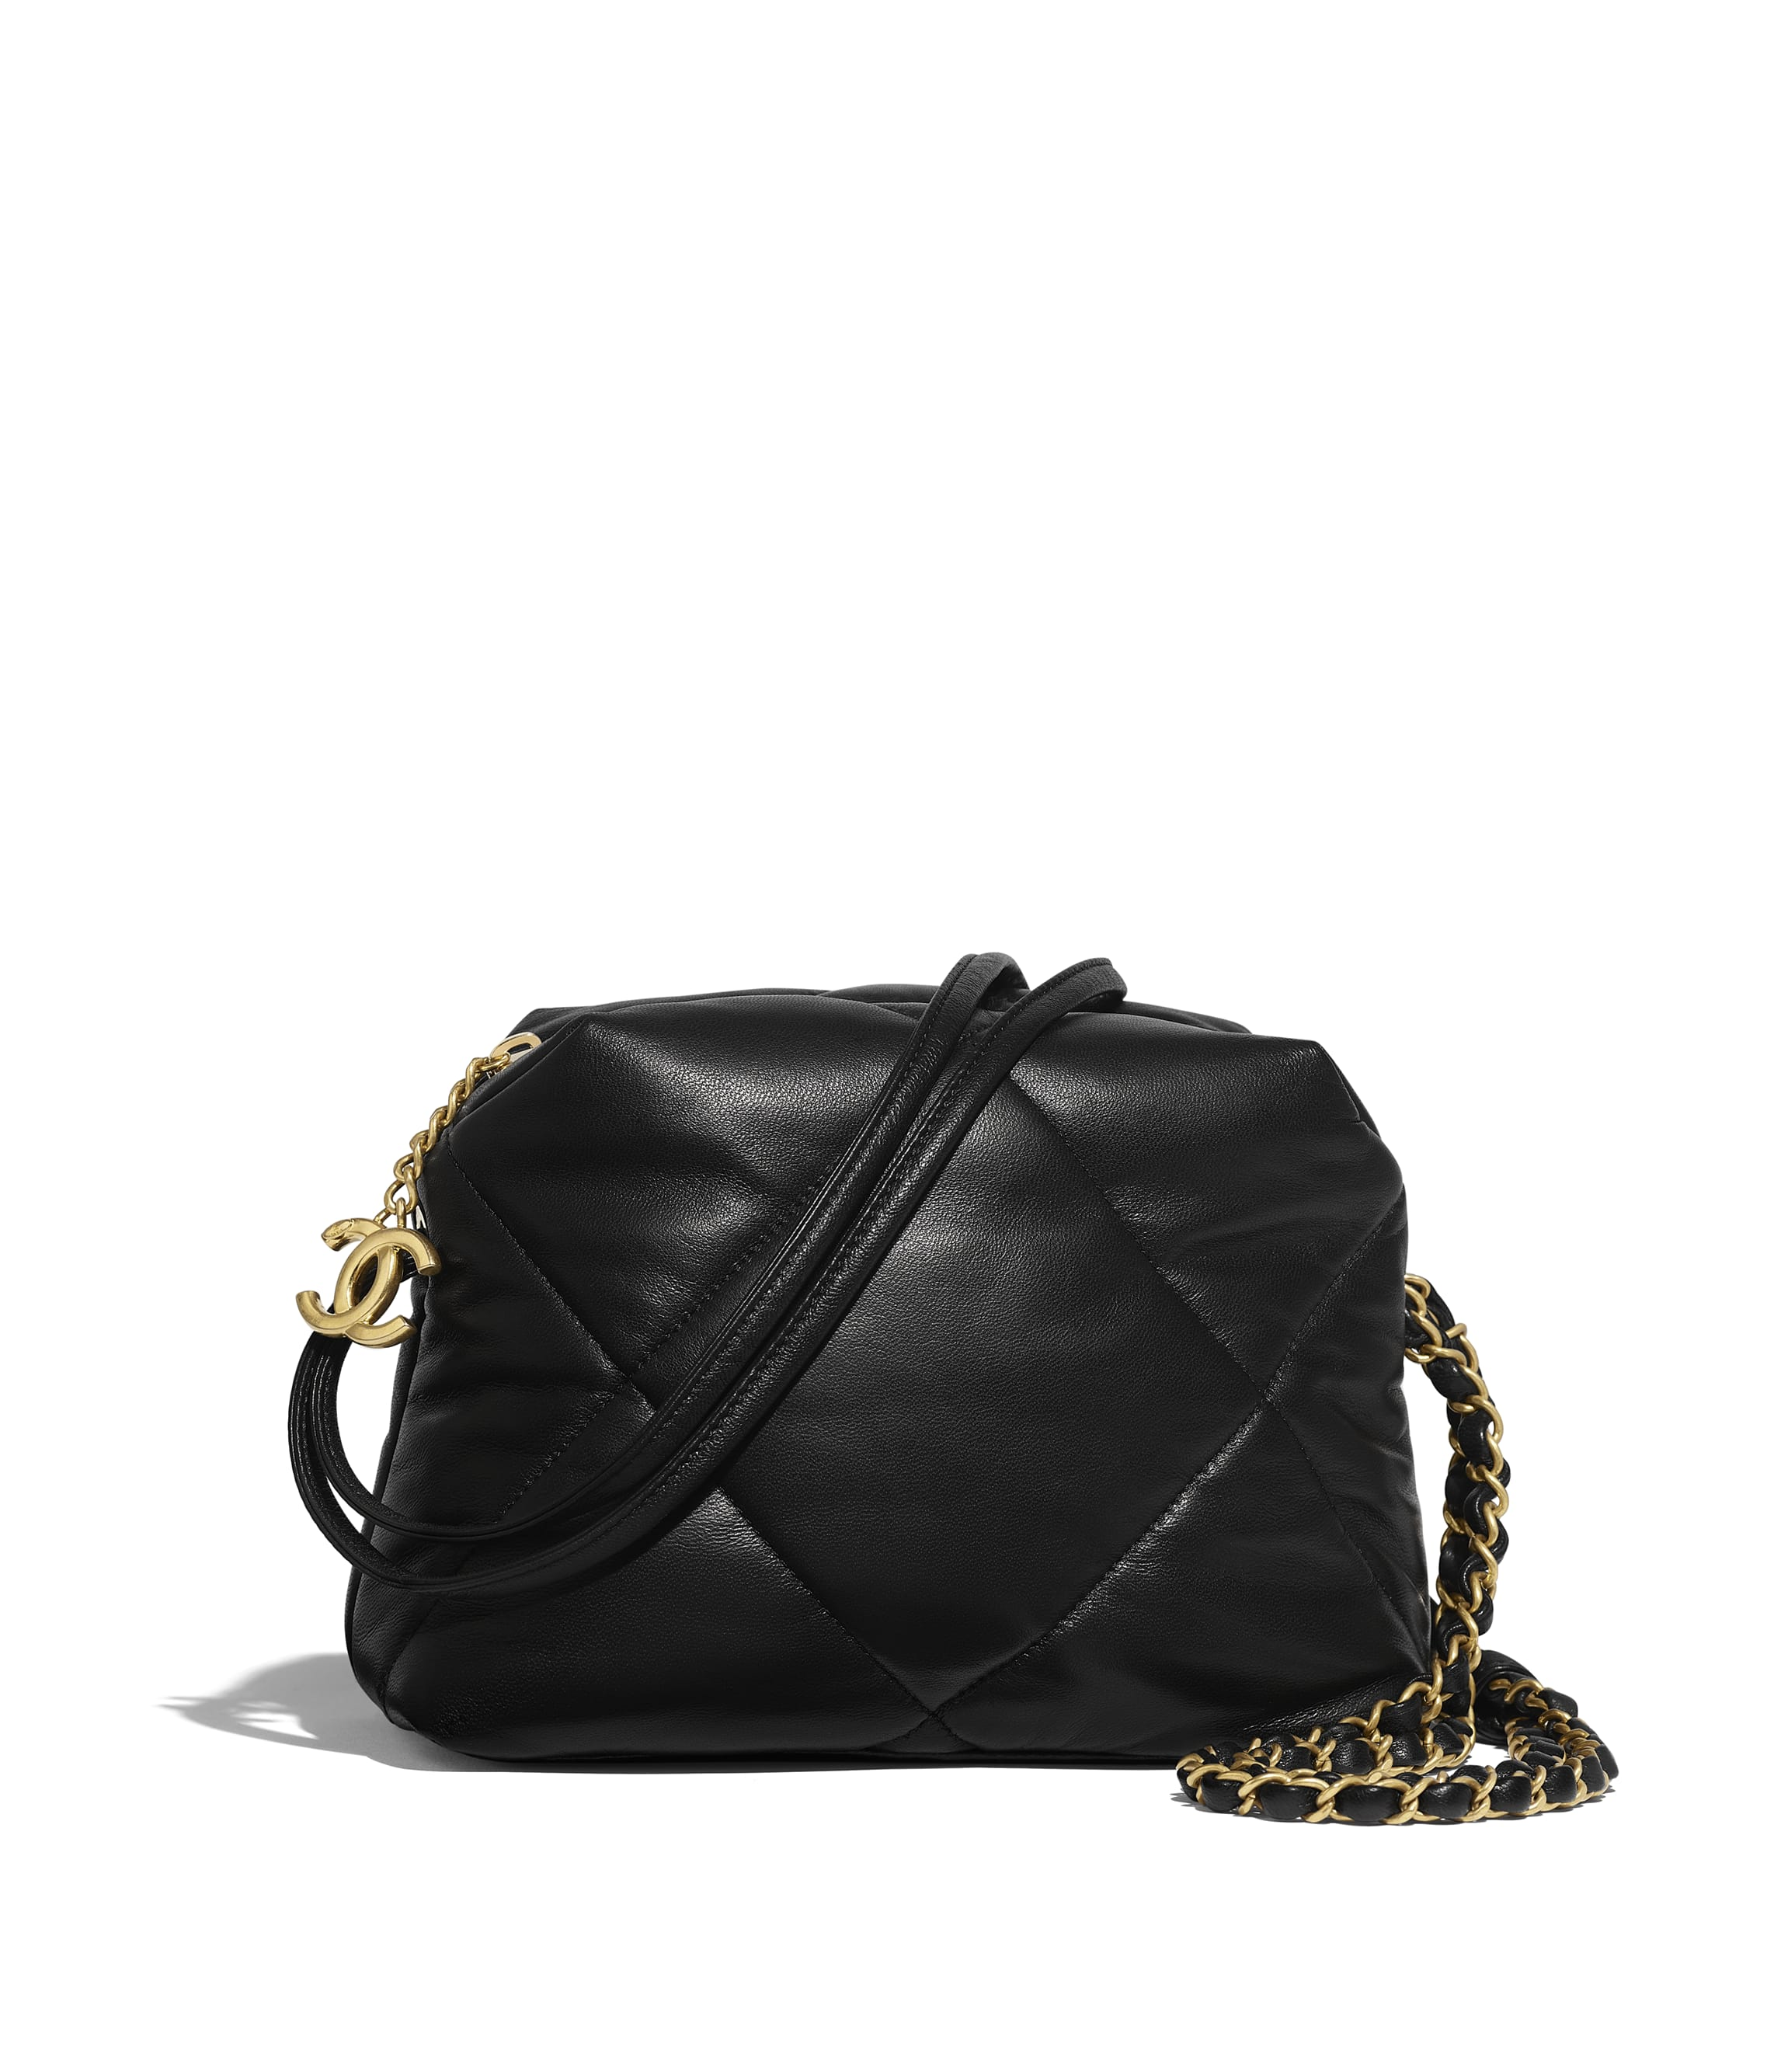 Small Bowling Bag Lambskin Black Chanel